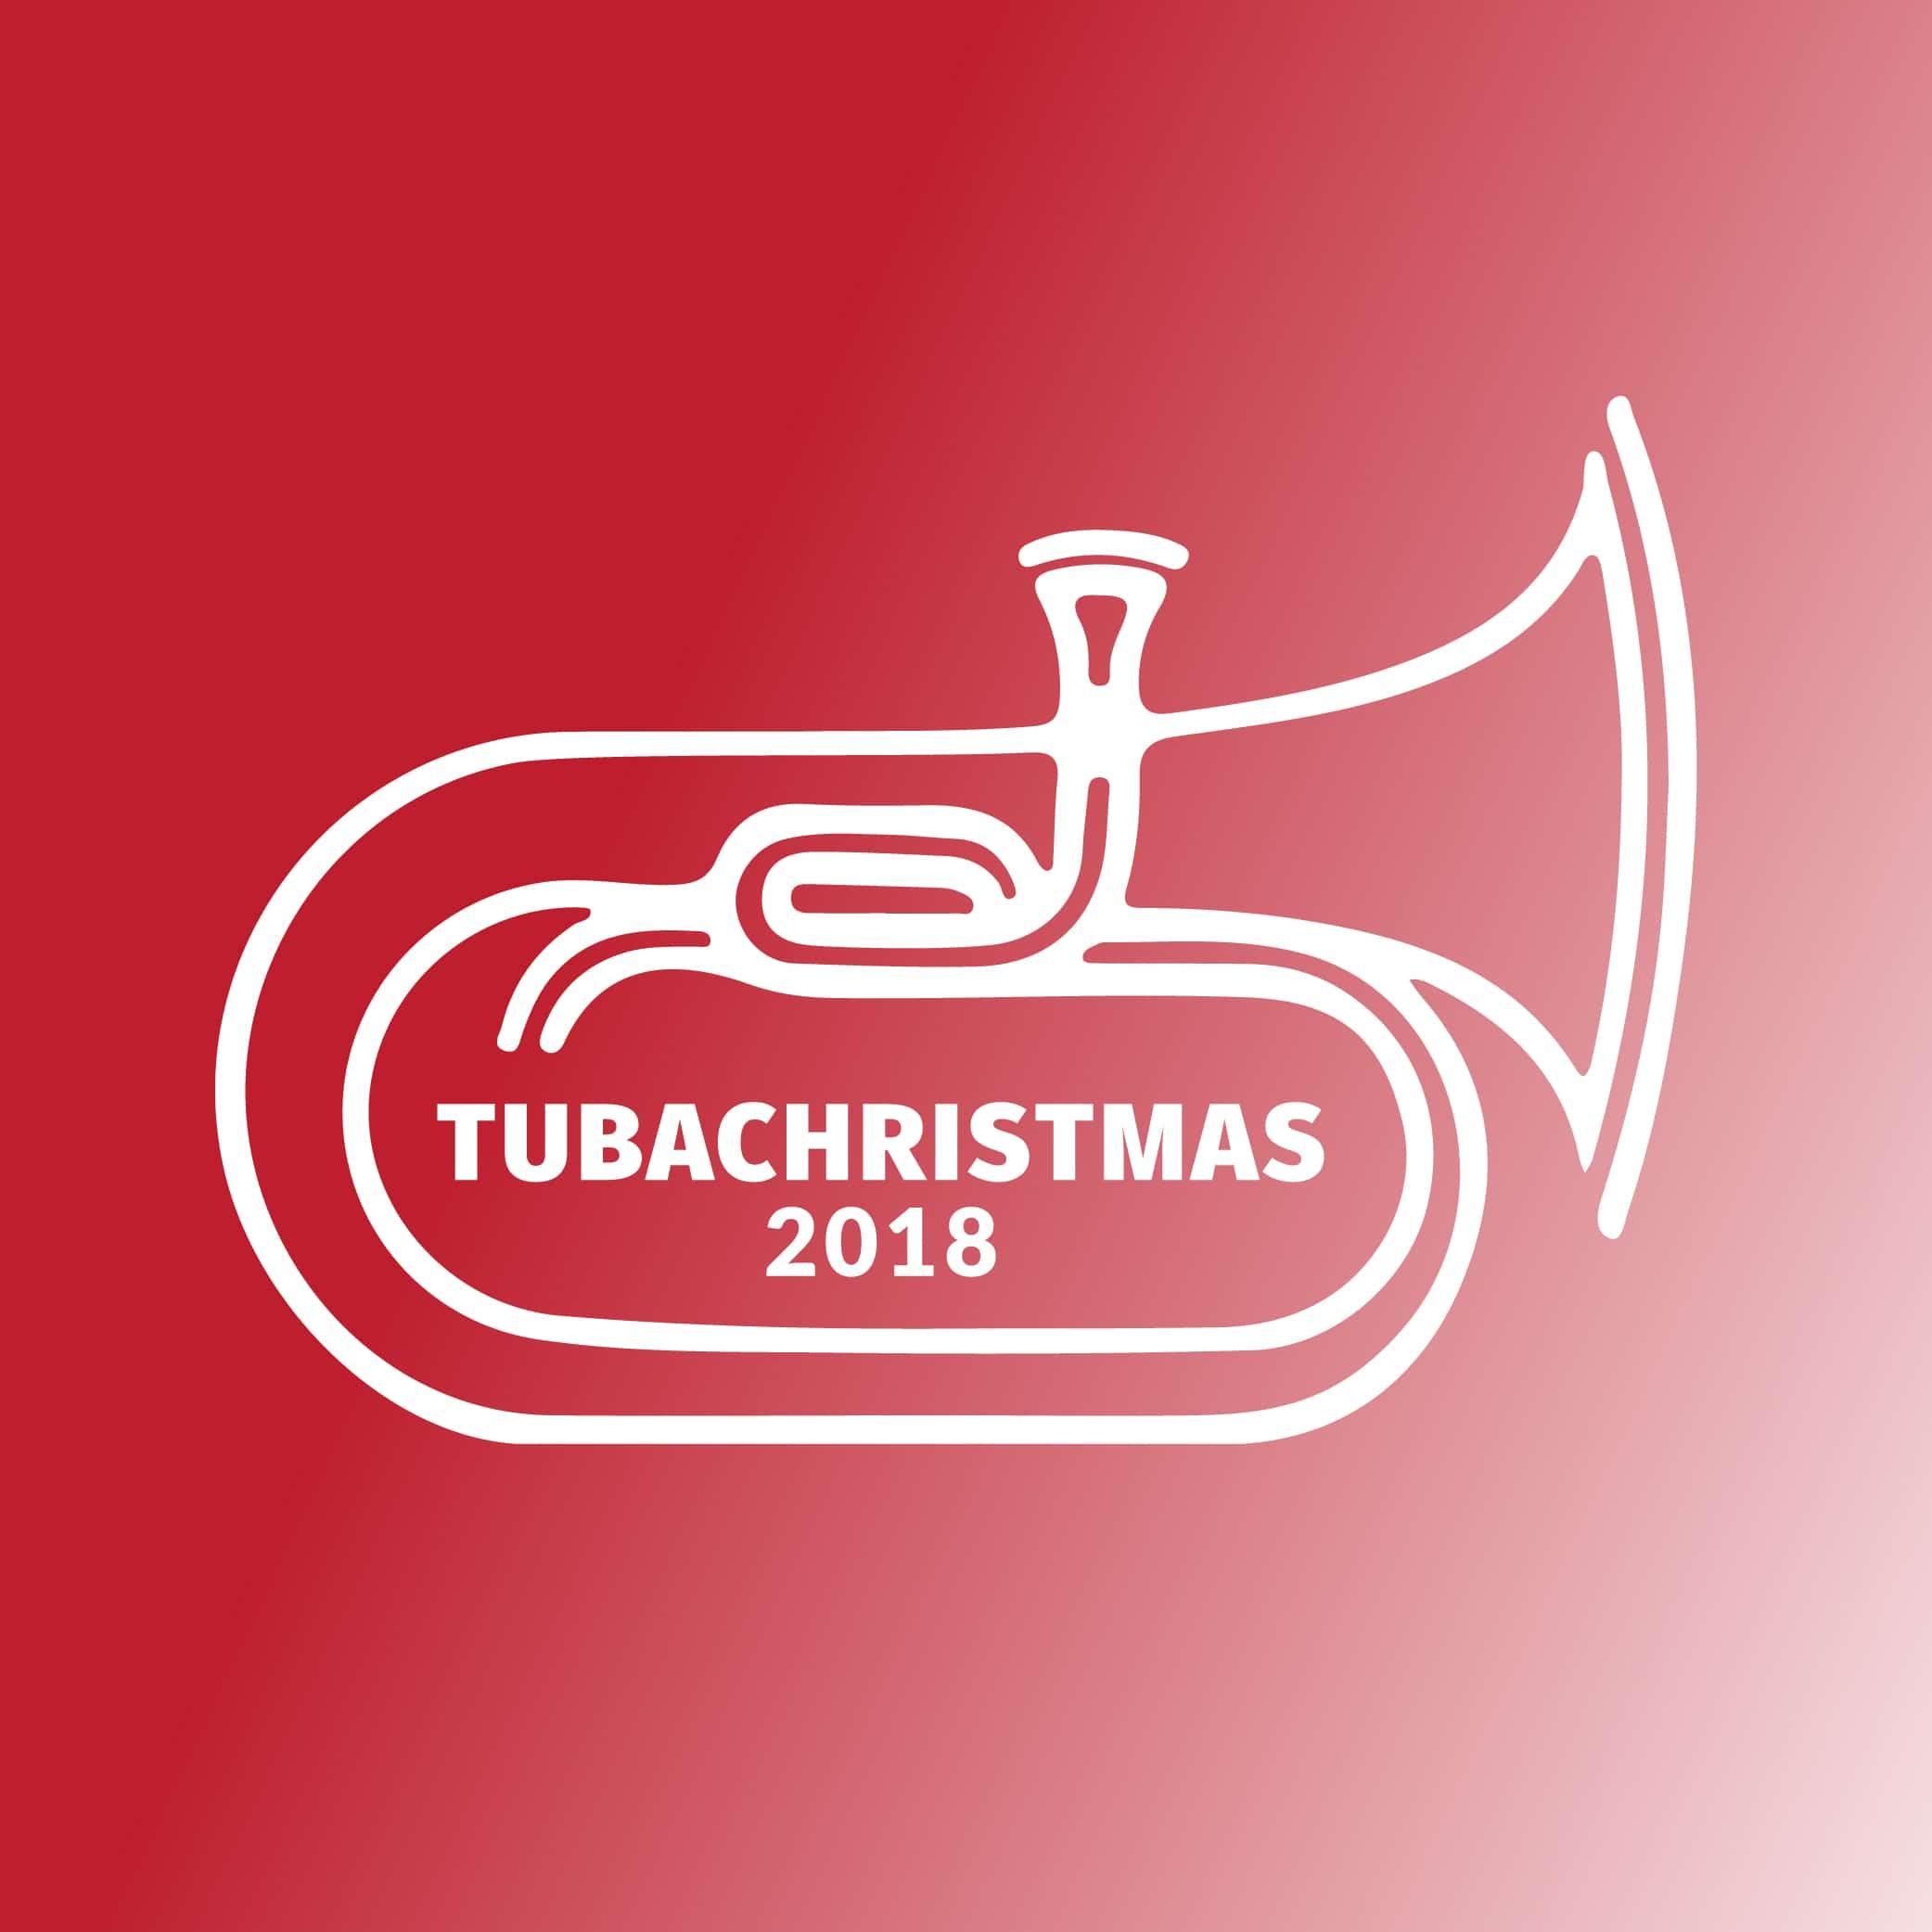 JSO_TubaChristmas_WebBanners_Thumbnail